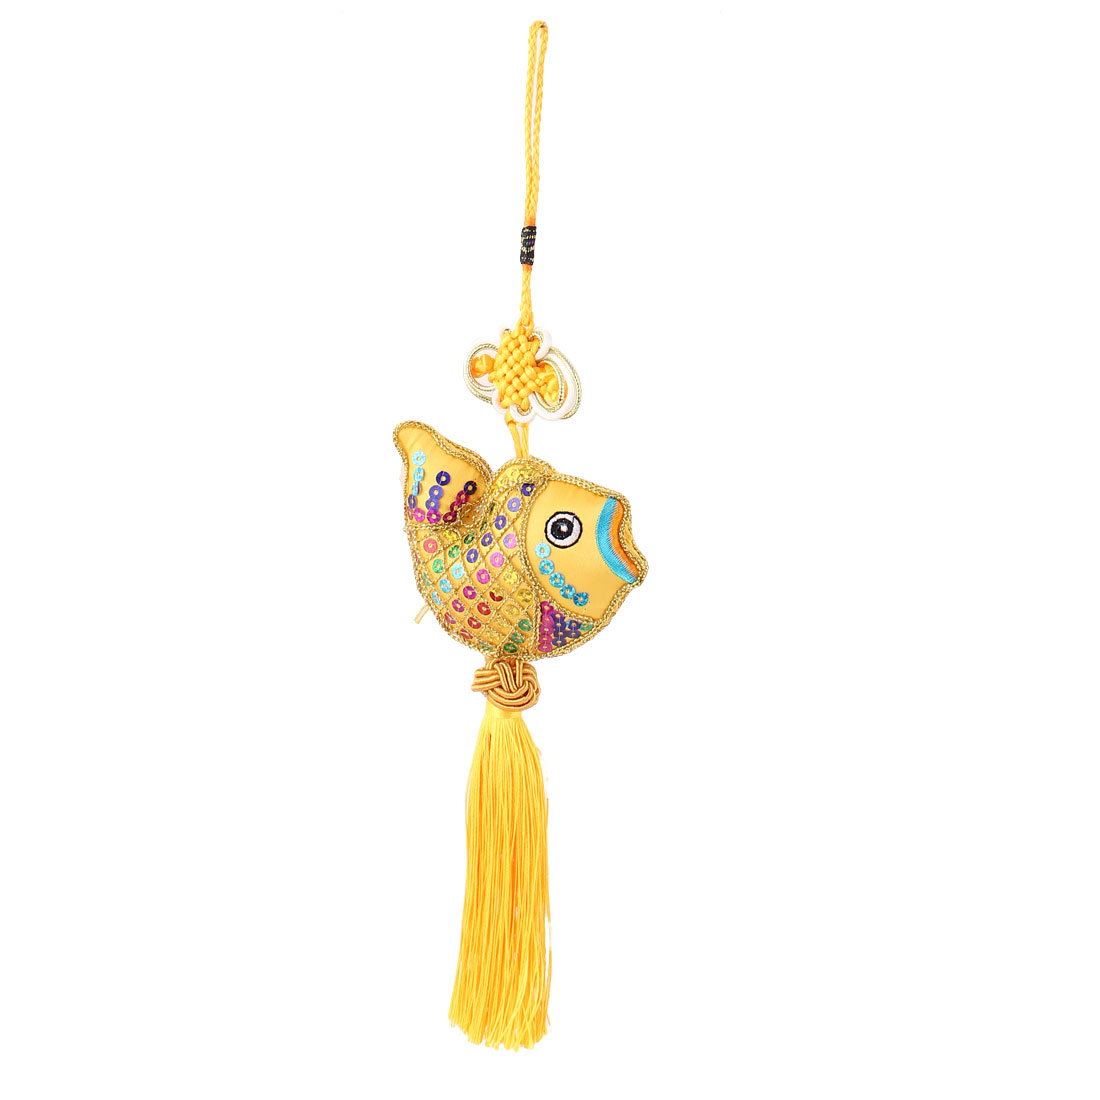 Nylon Braid Tassel Decor Chinese Knot Hanging Decoration Yellow